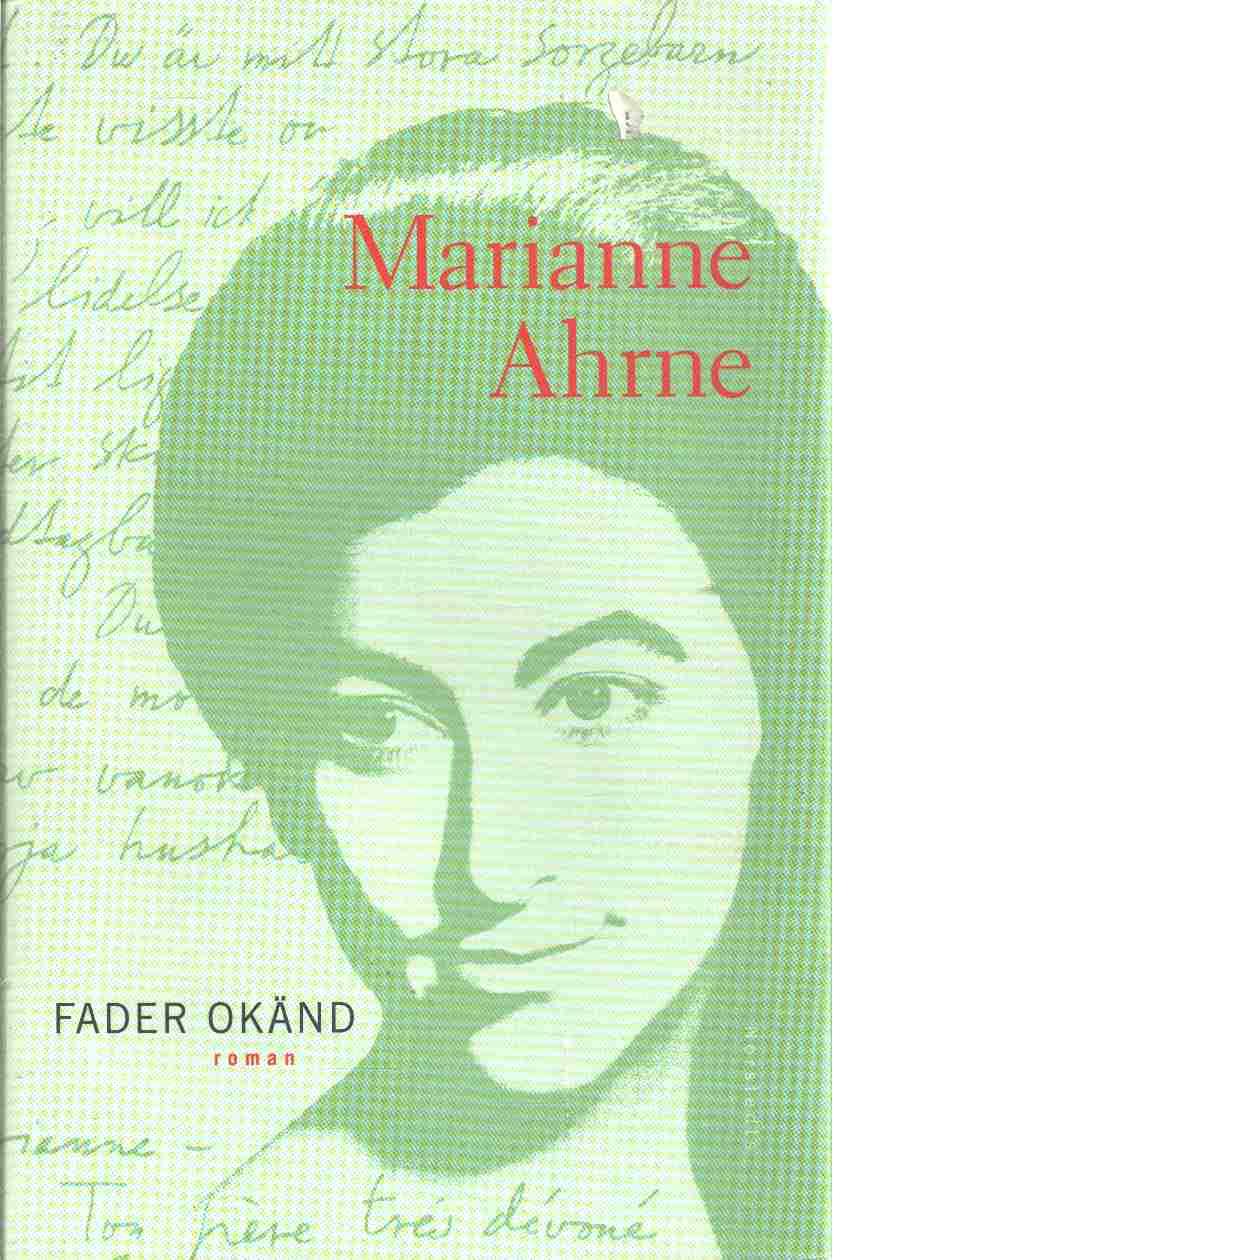 Fader okänd : roman - Ahrne, Marianne